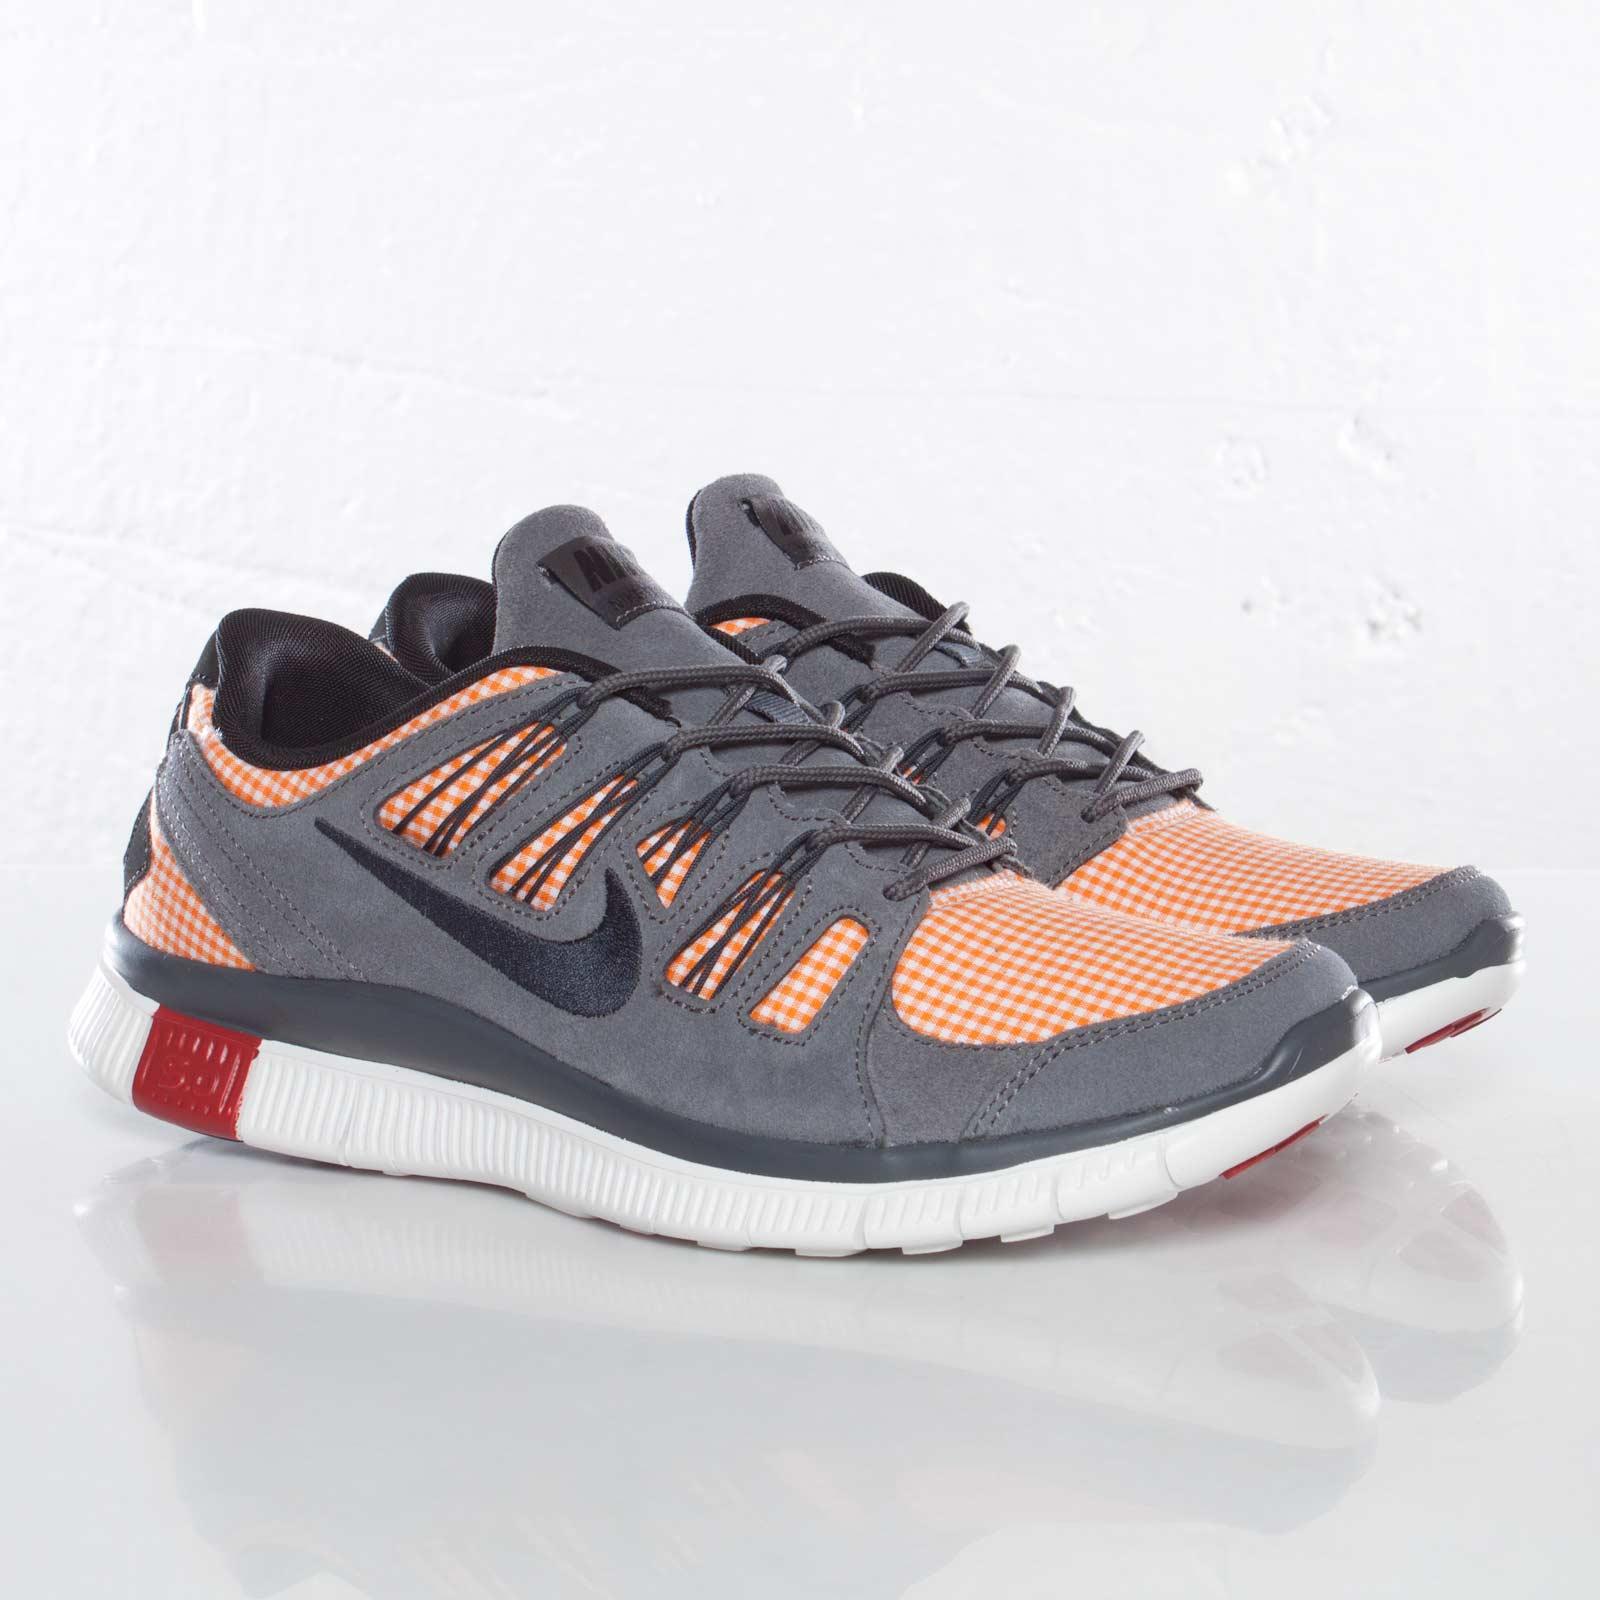 hot sale online e391f 86cfc Nike Free 5.0 EXT QS